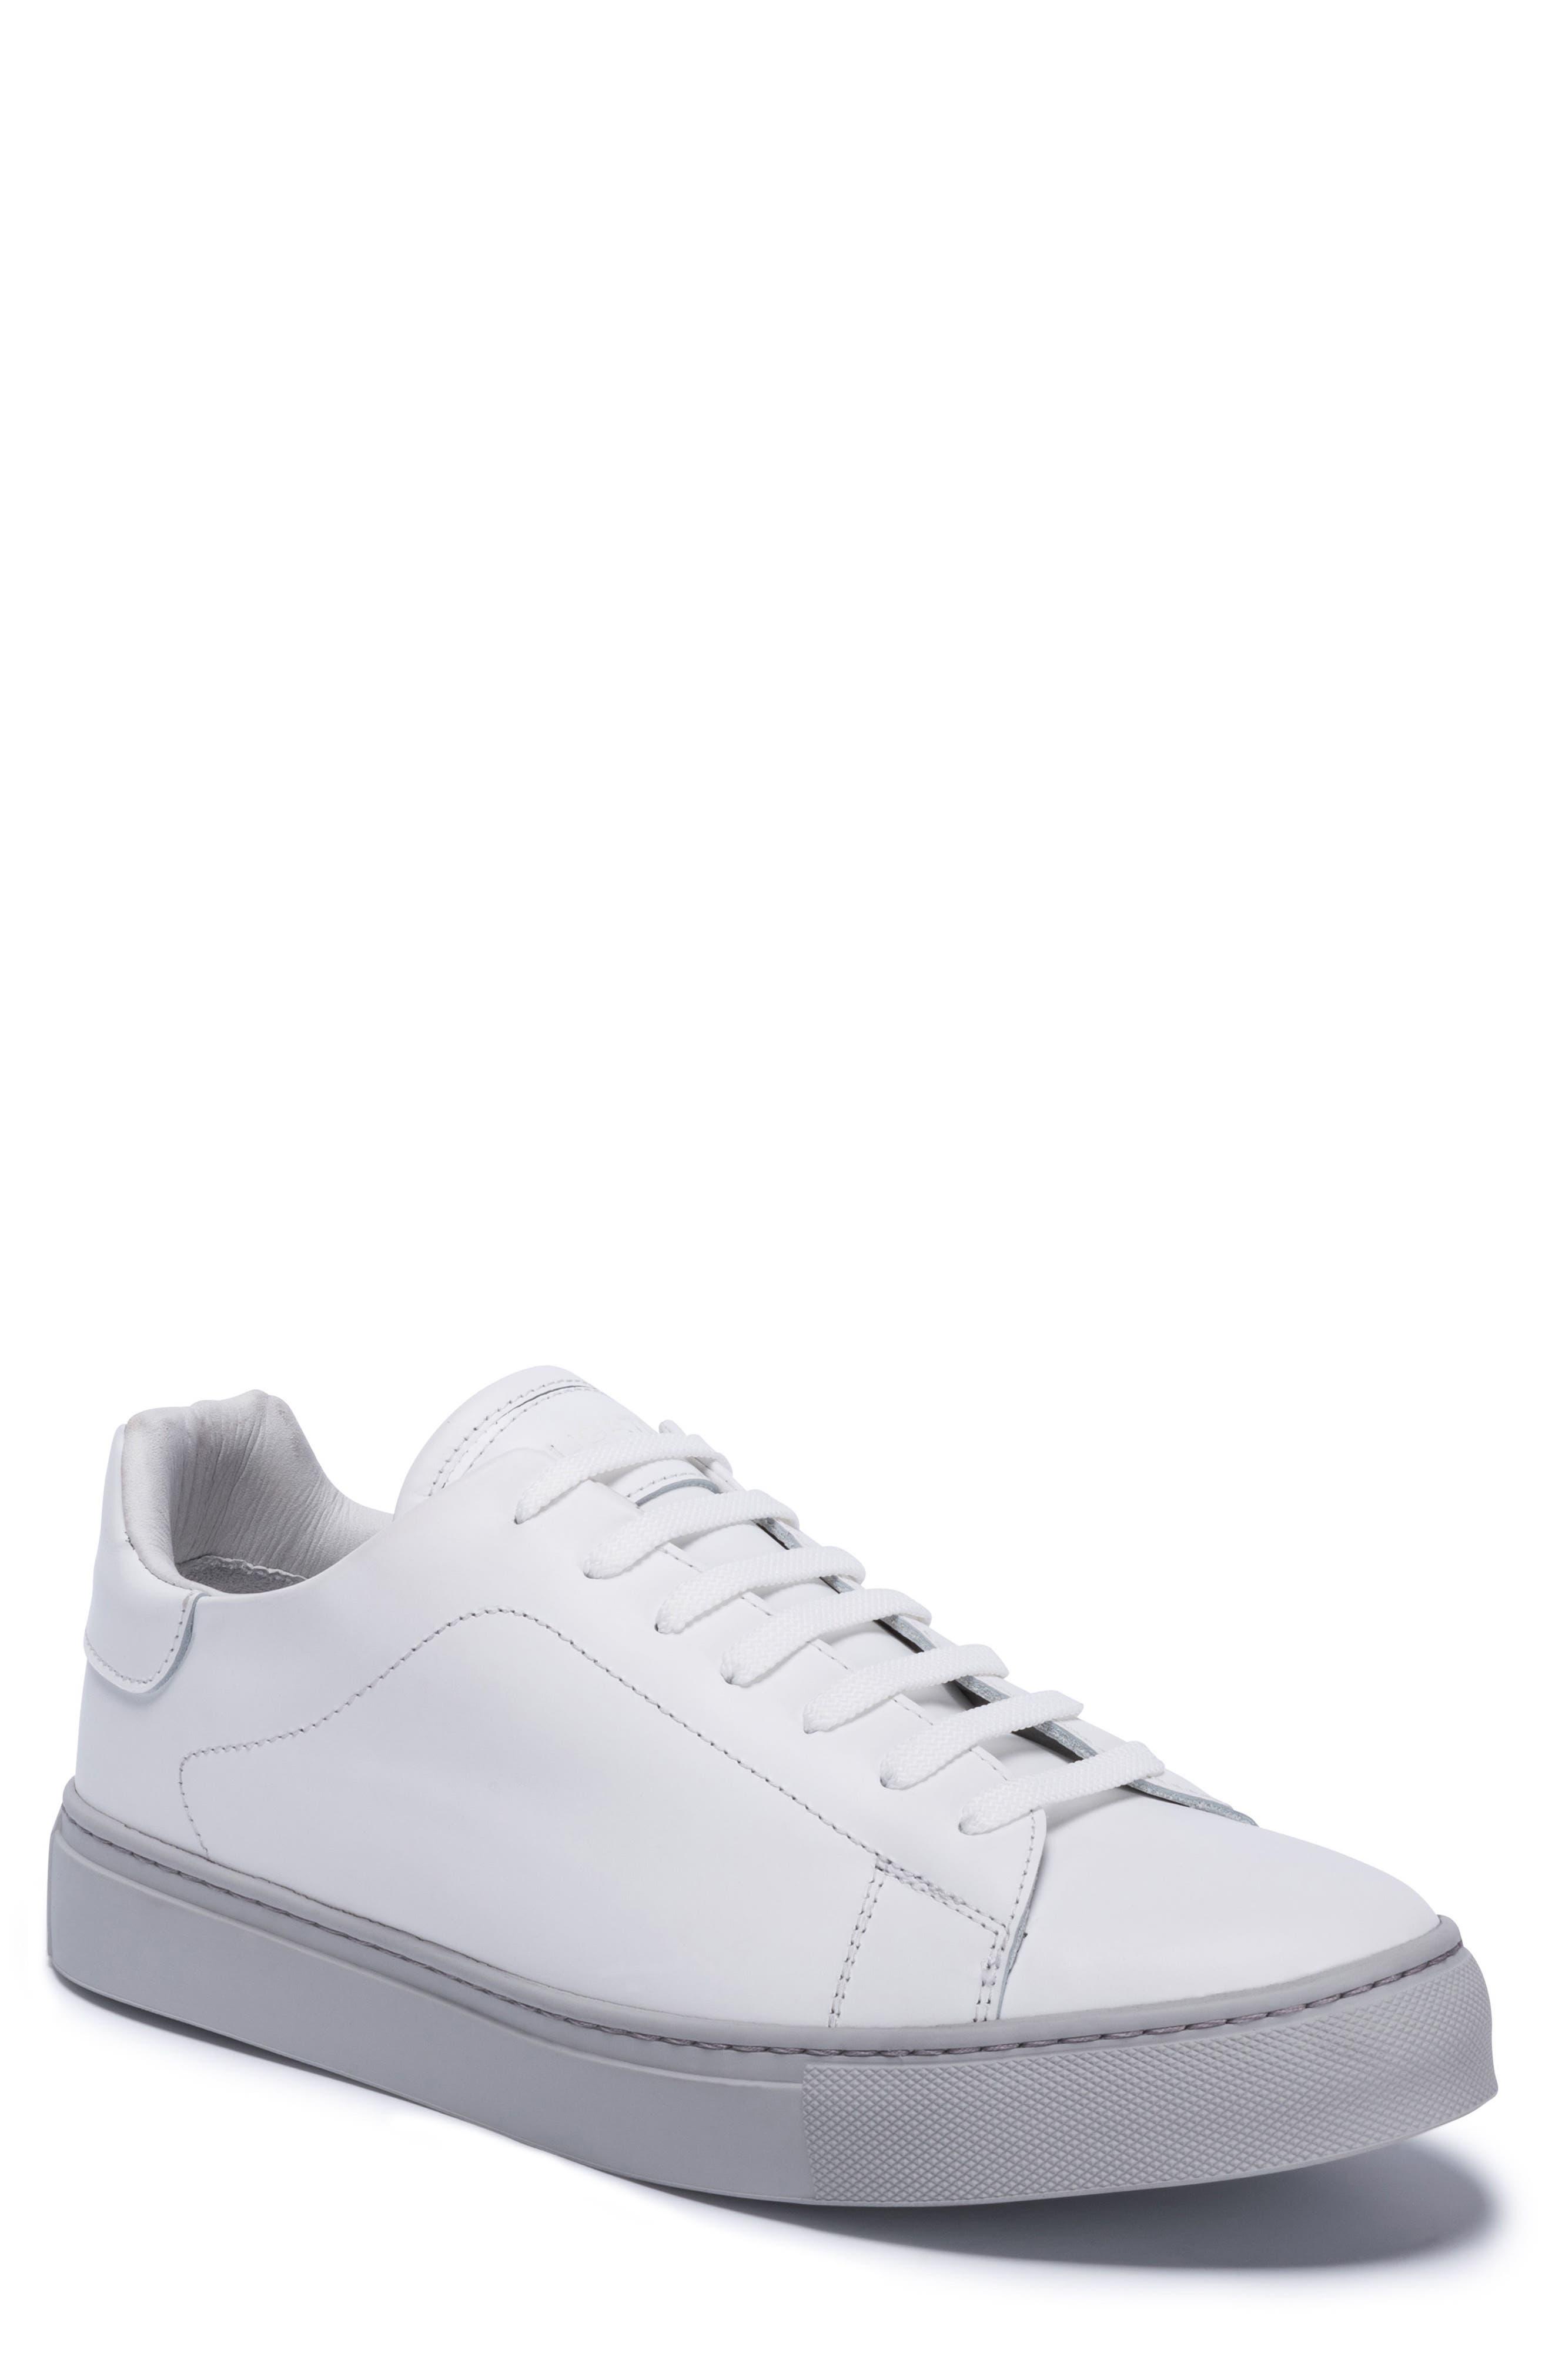 Massa Sneaker,                         Main,                         color, Bianco Leather